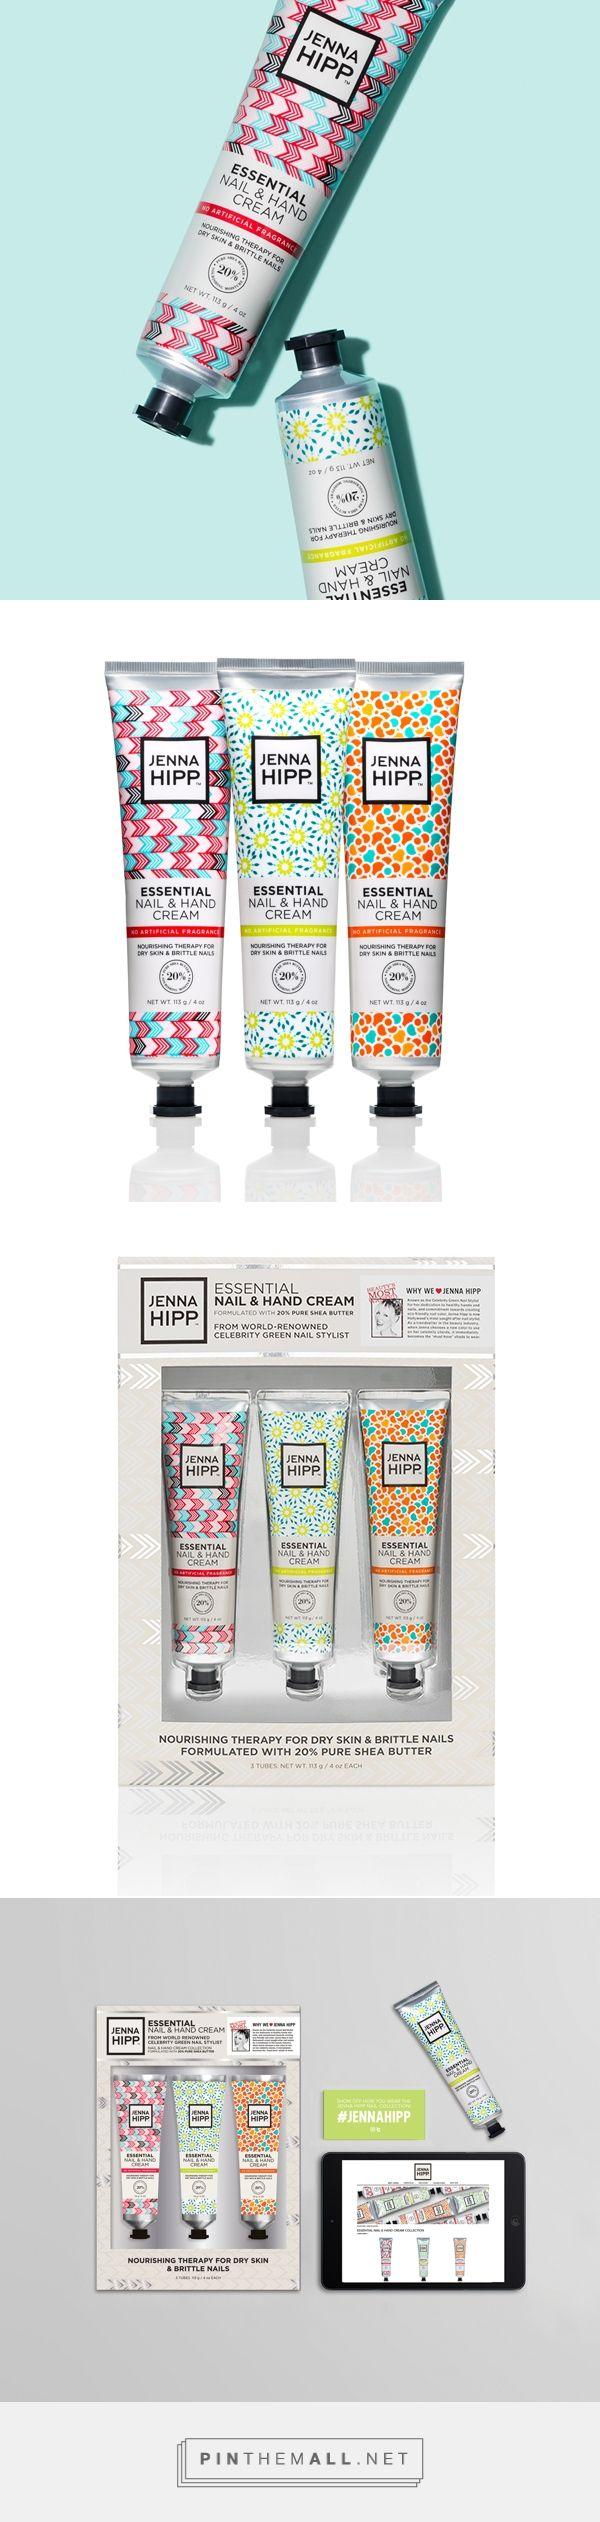 Jenna Hipp Nail & Hand Cream Branding & Packaging Designed by Kasey Dasko